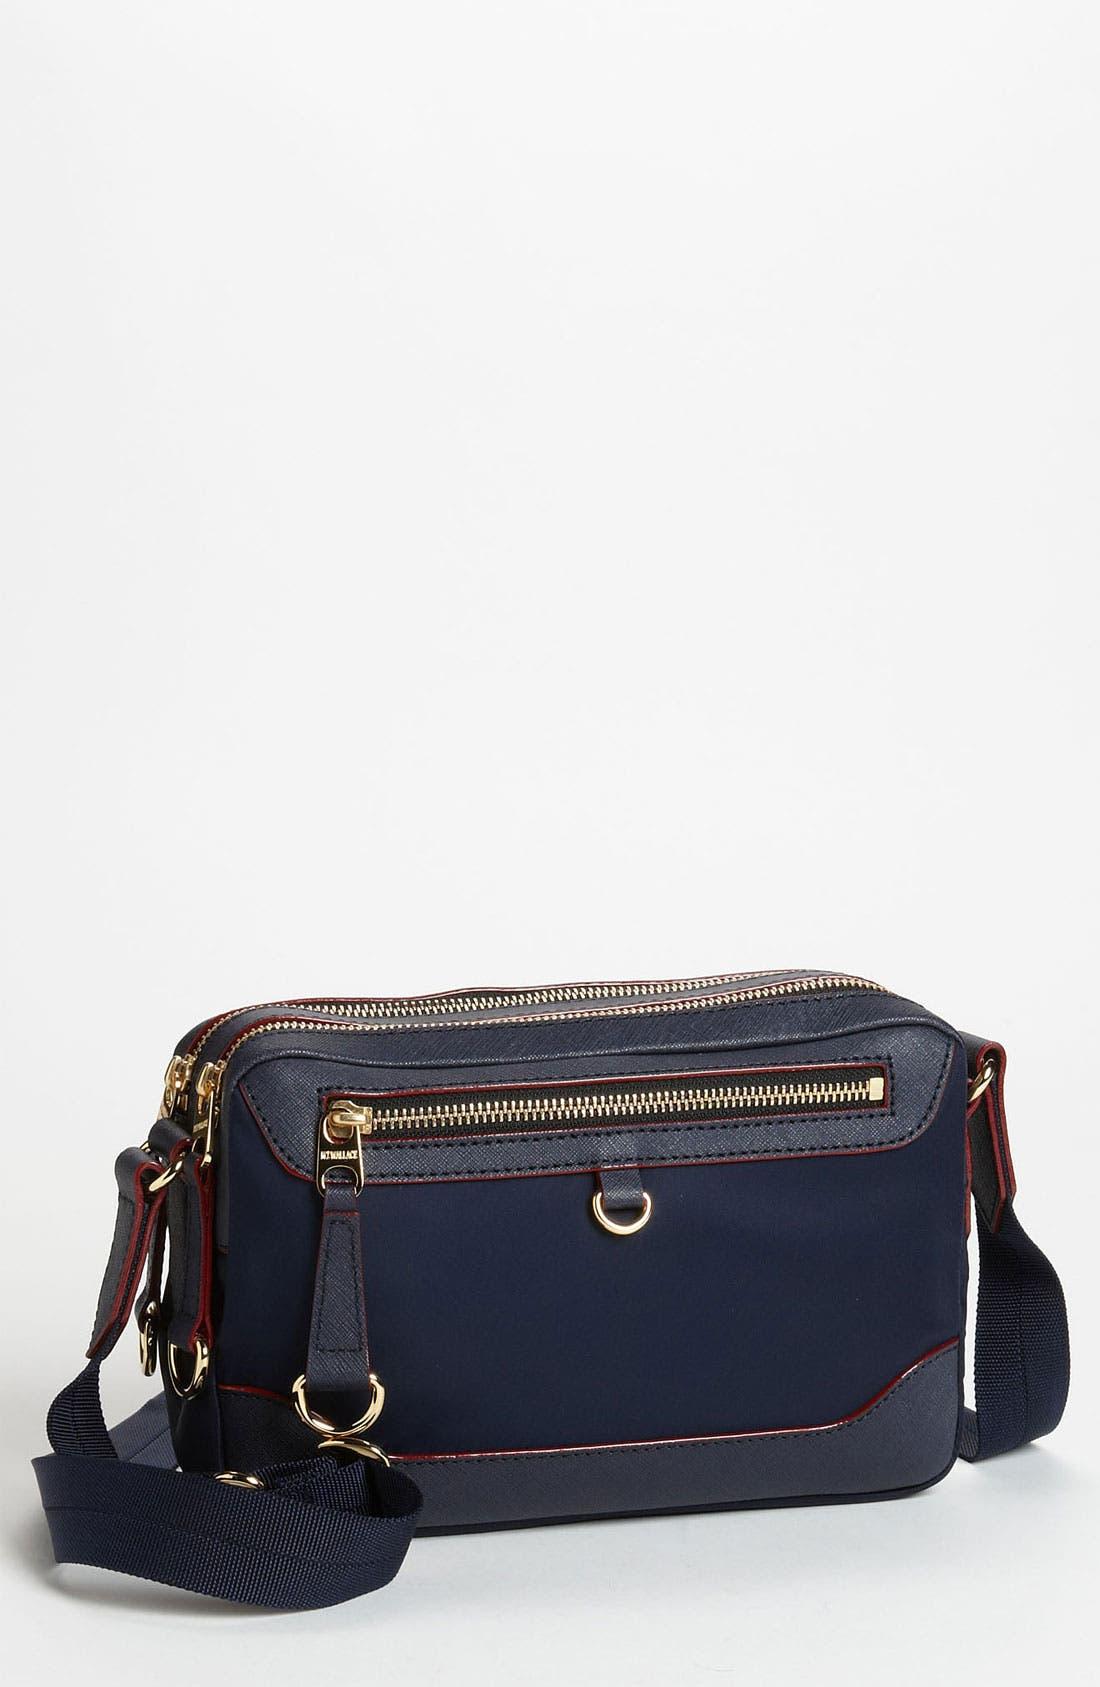 Alternate Image 1 Selected - MZ Wallace 'Lila' Crossbody Bag